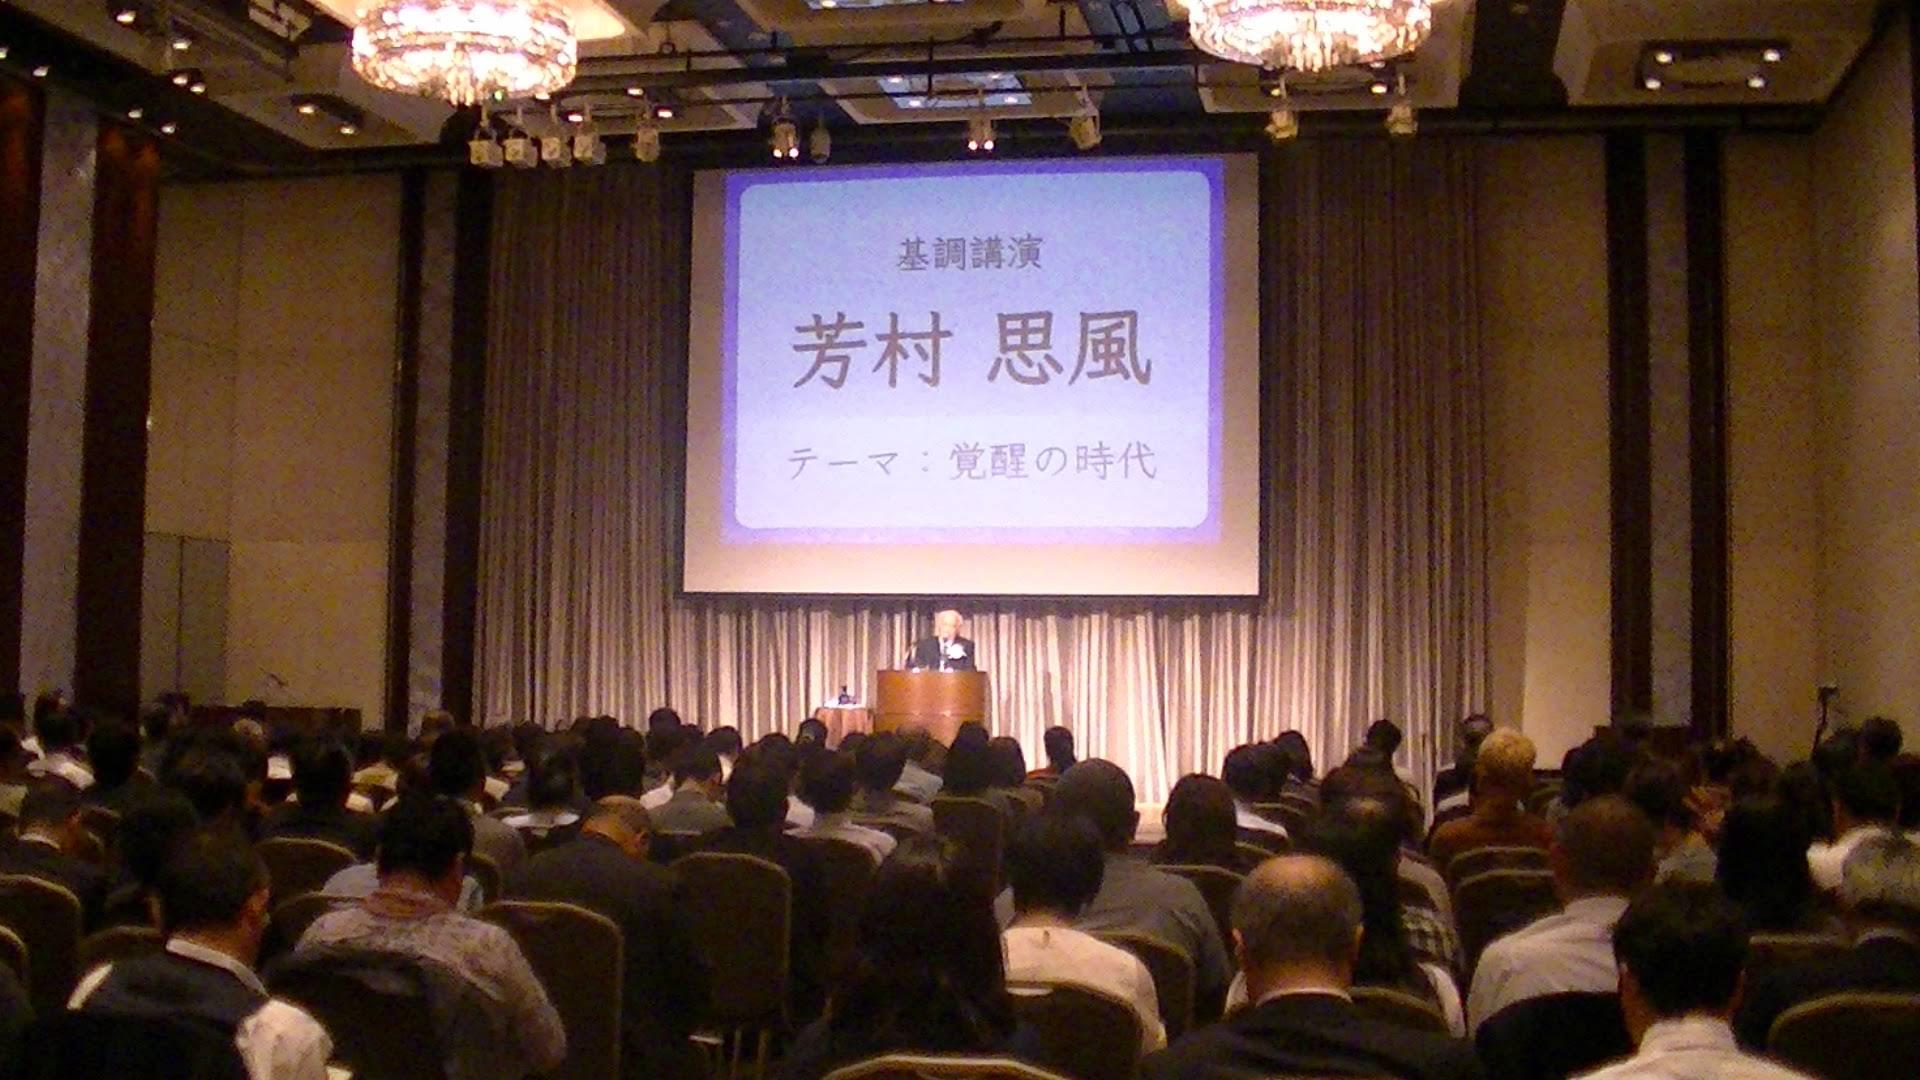 PIC 1719 1 - 思風会全国大会in広島